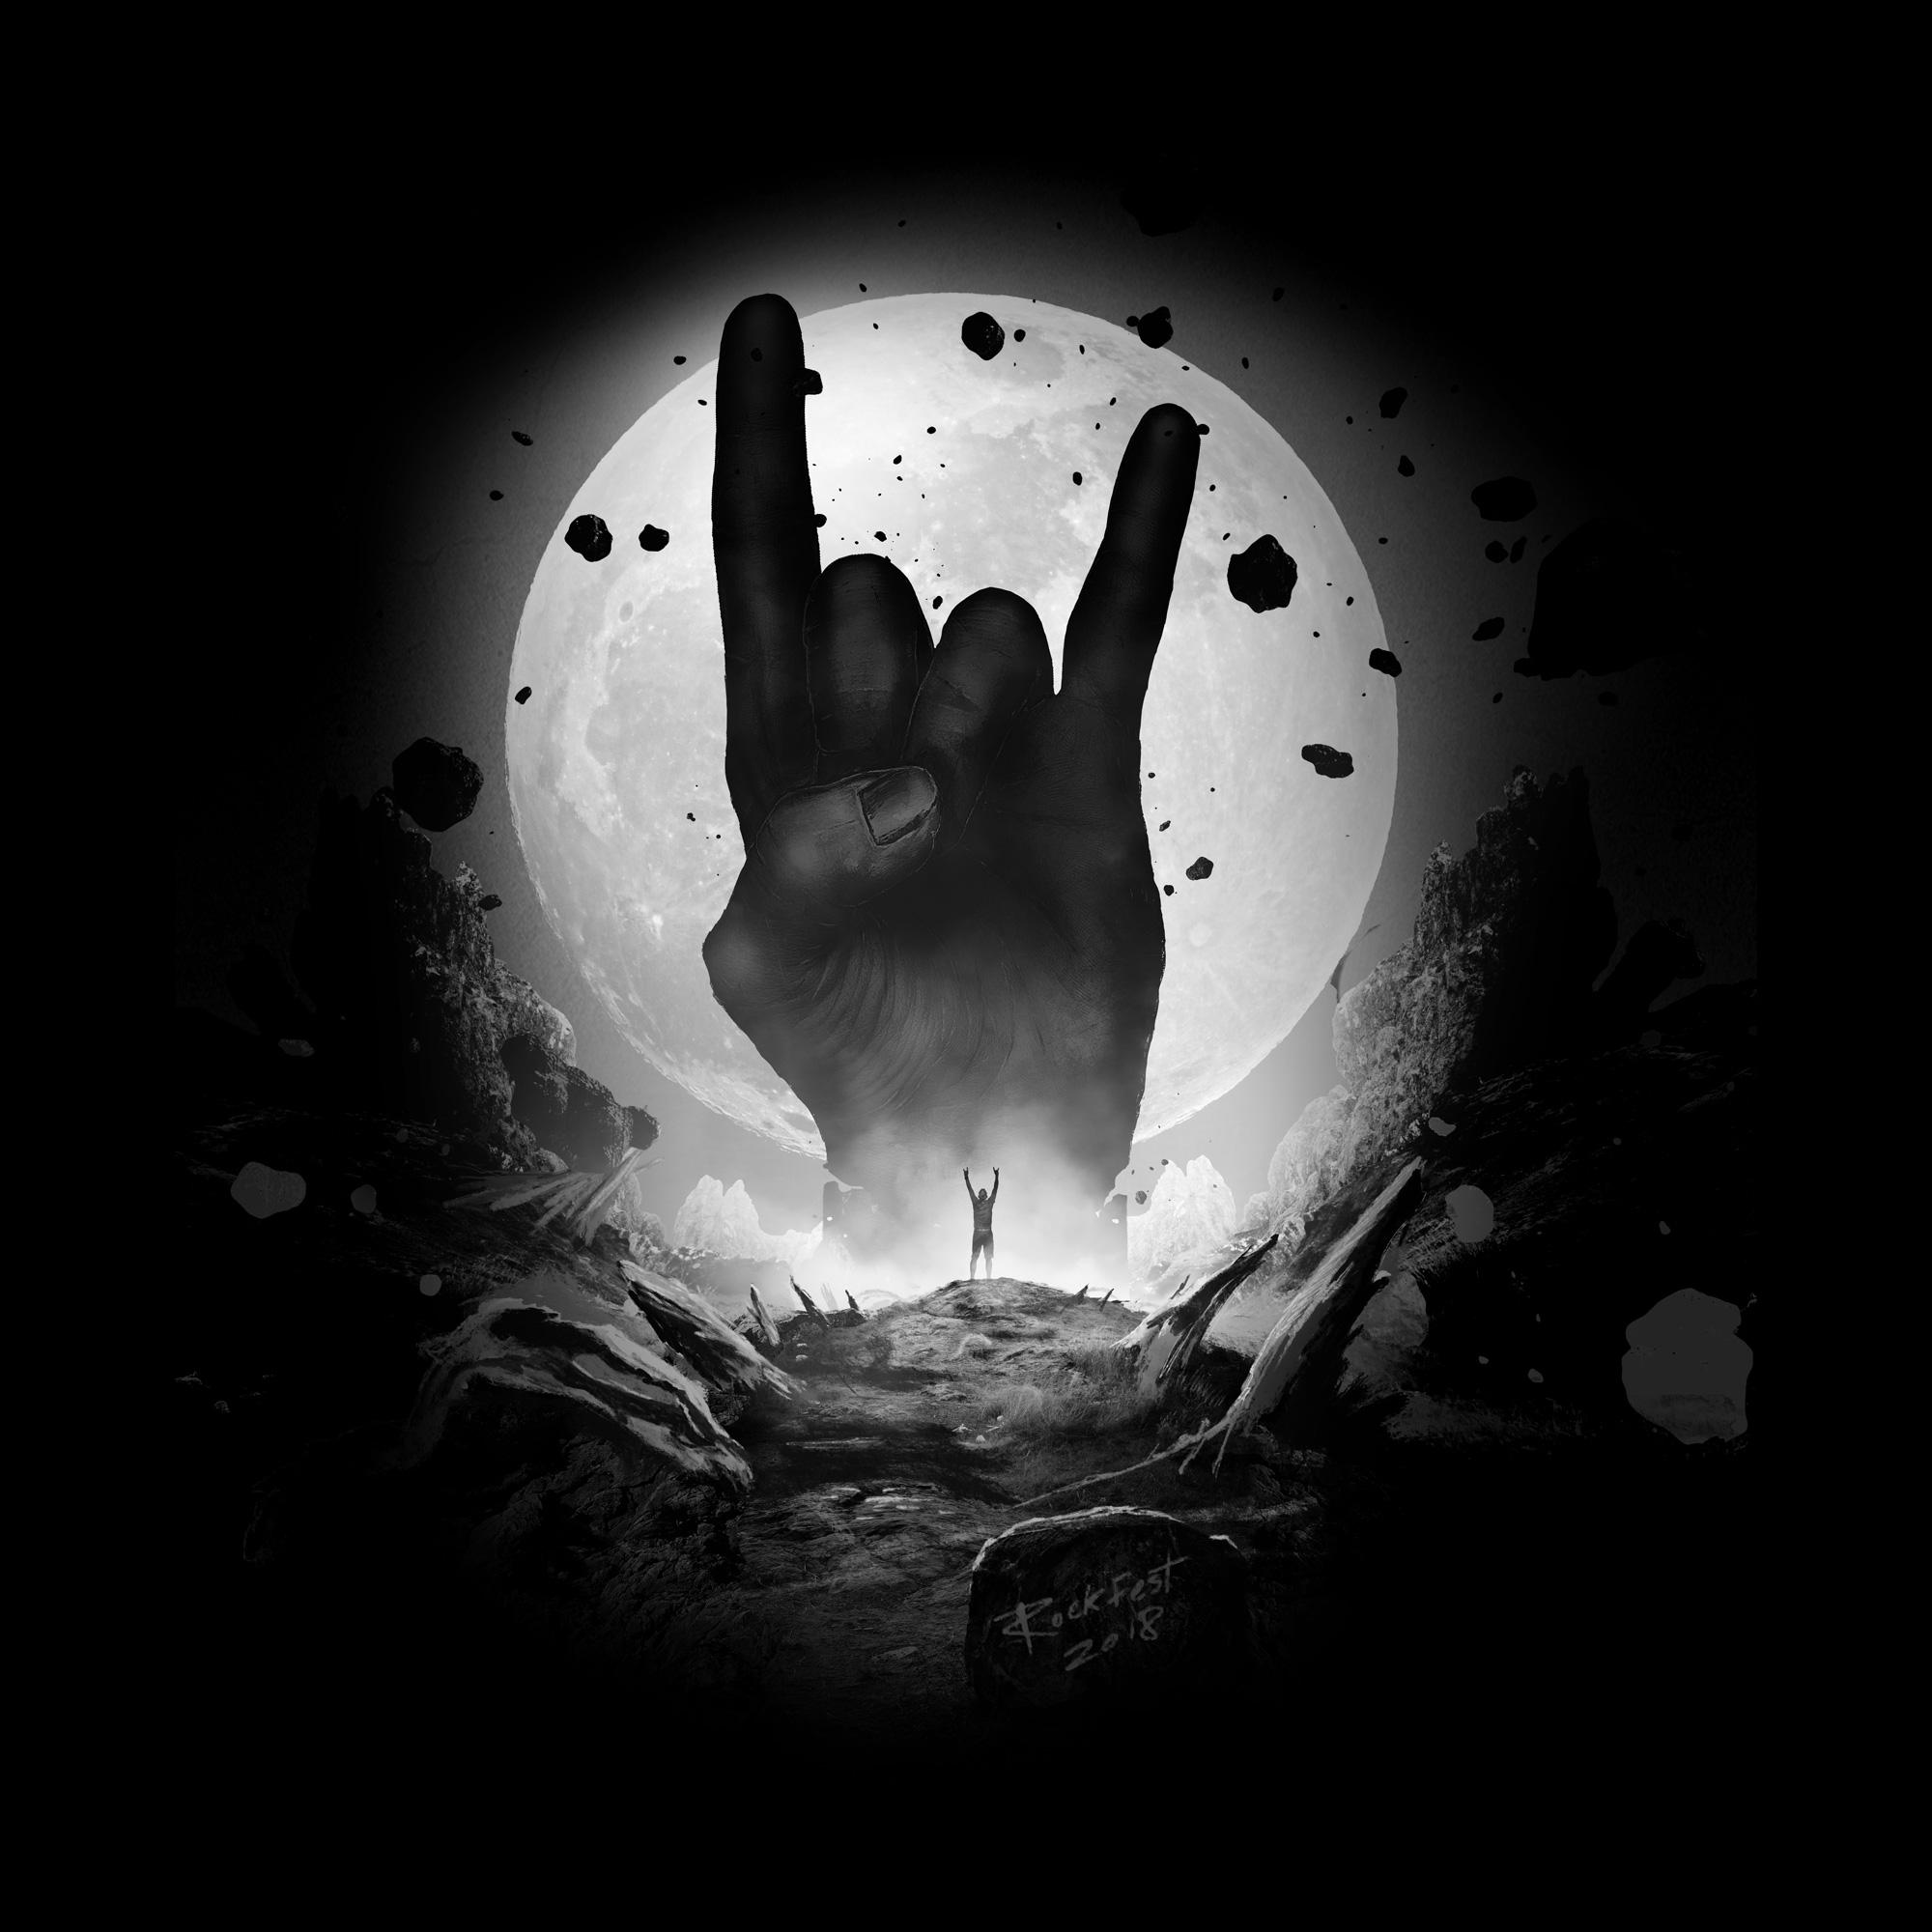 """Moon"", Rockfest 2018 merchandise artwork"